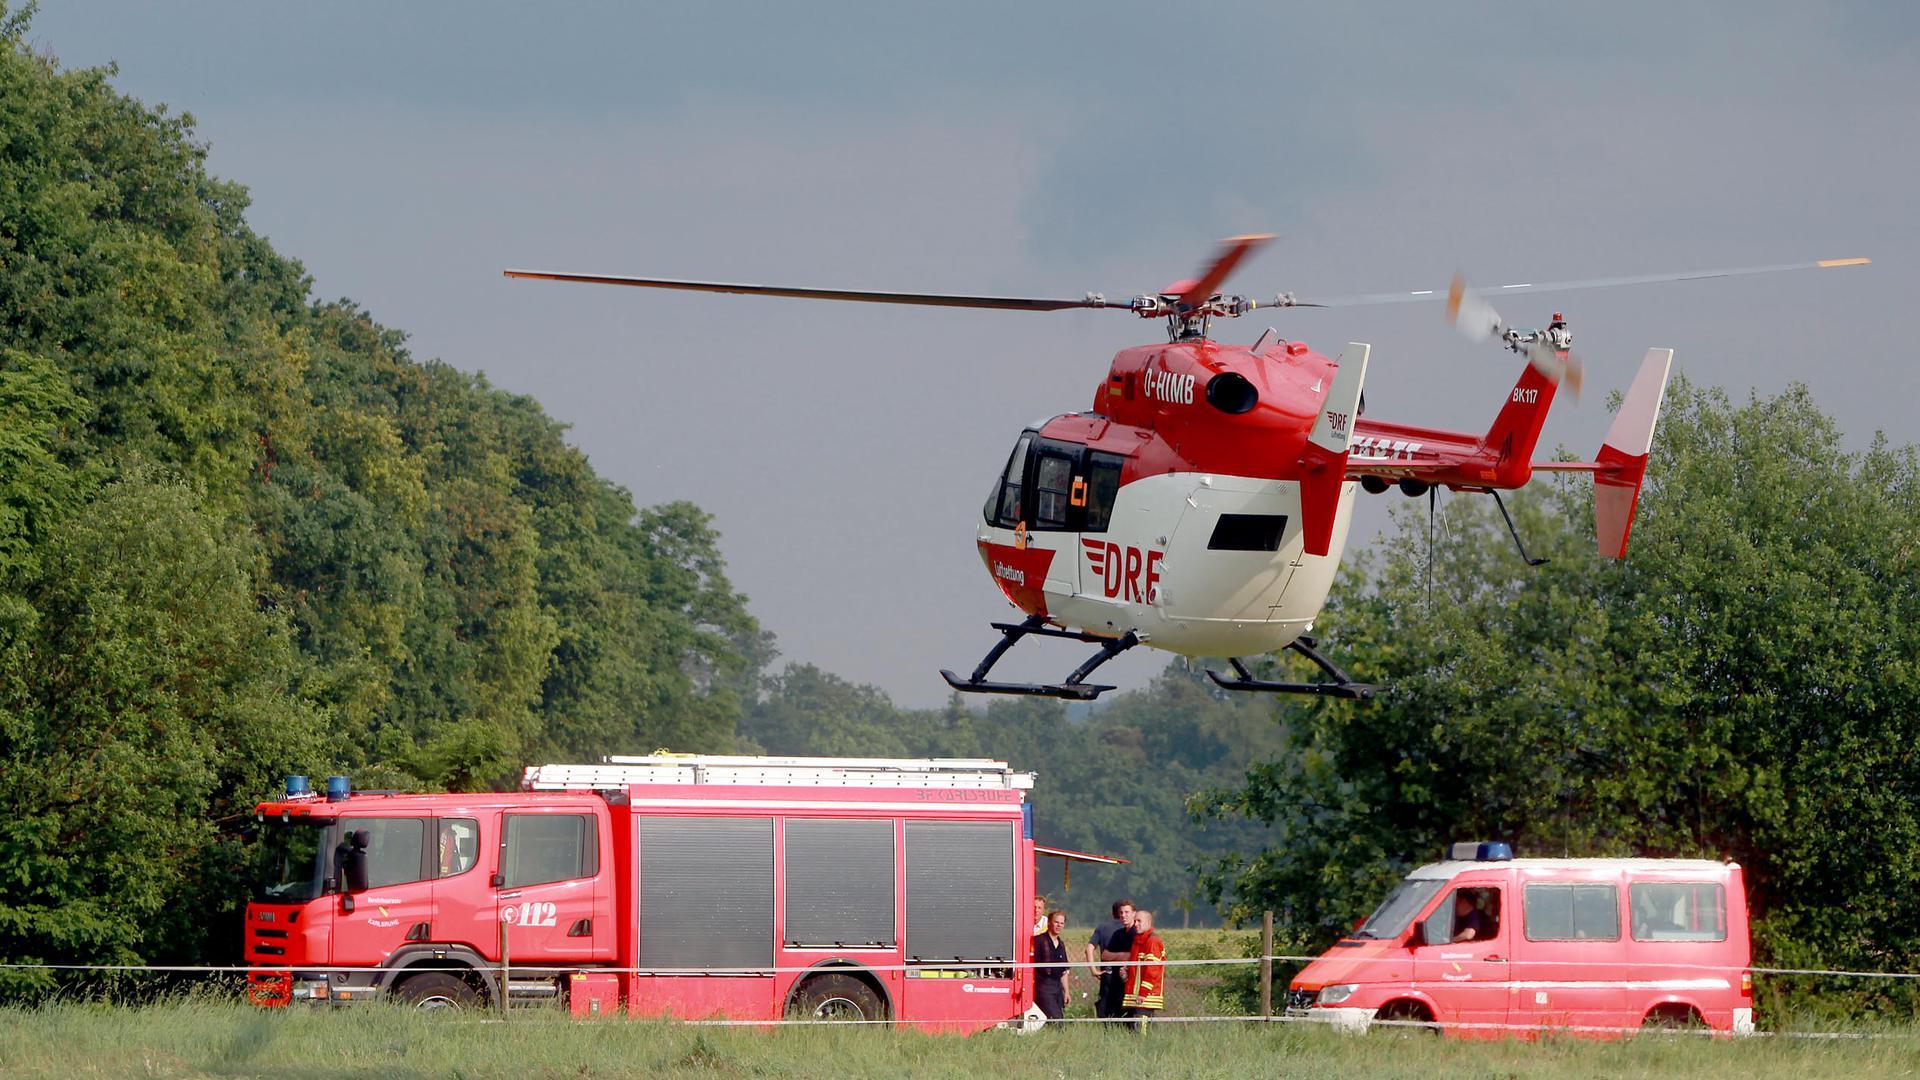 Flugzeugabsturz Flugzeugabsturz Flugplatz Rheinstetten am 30. Mai 2012